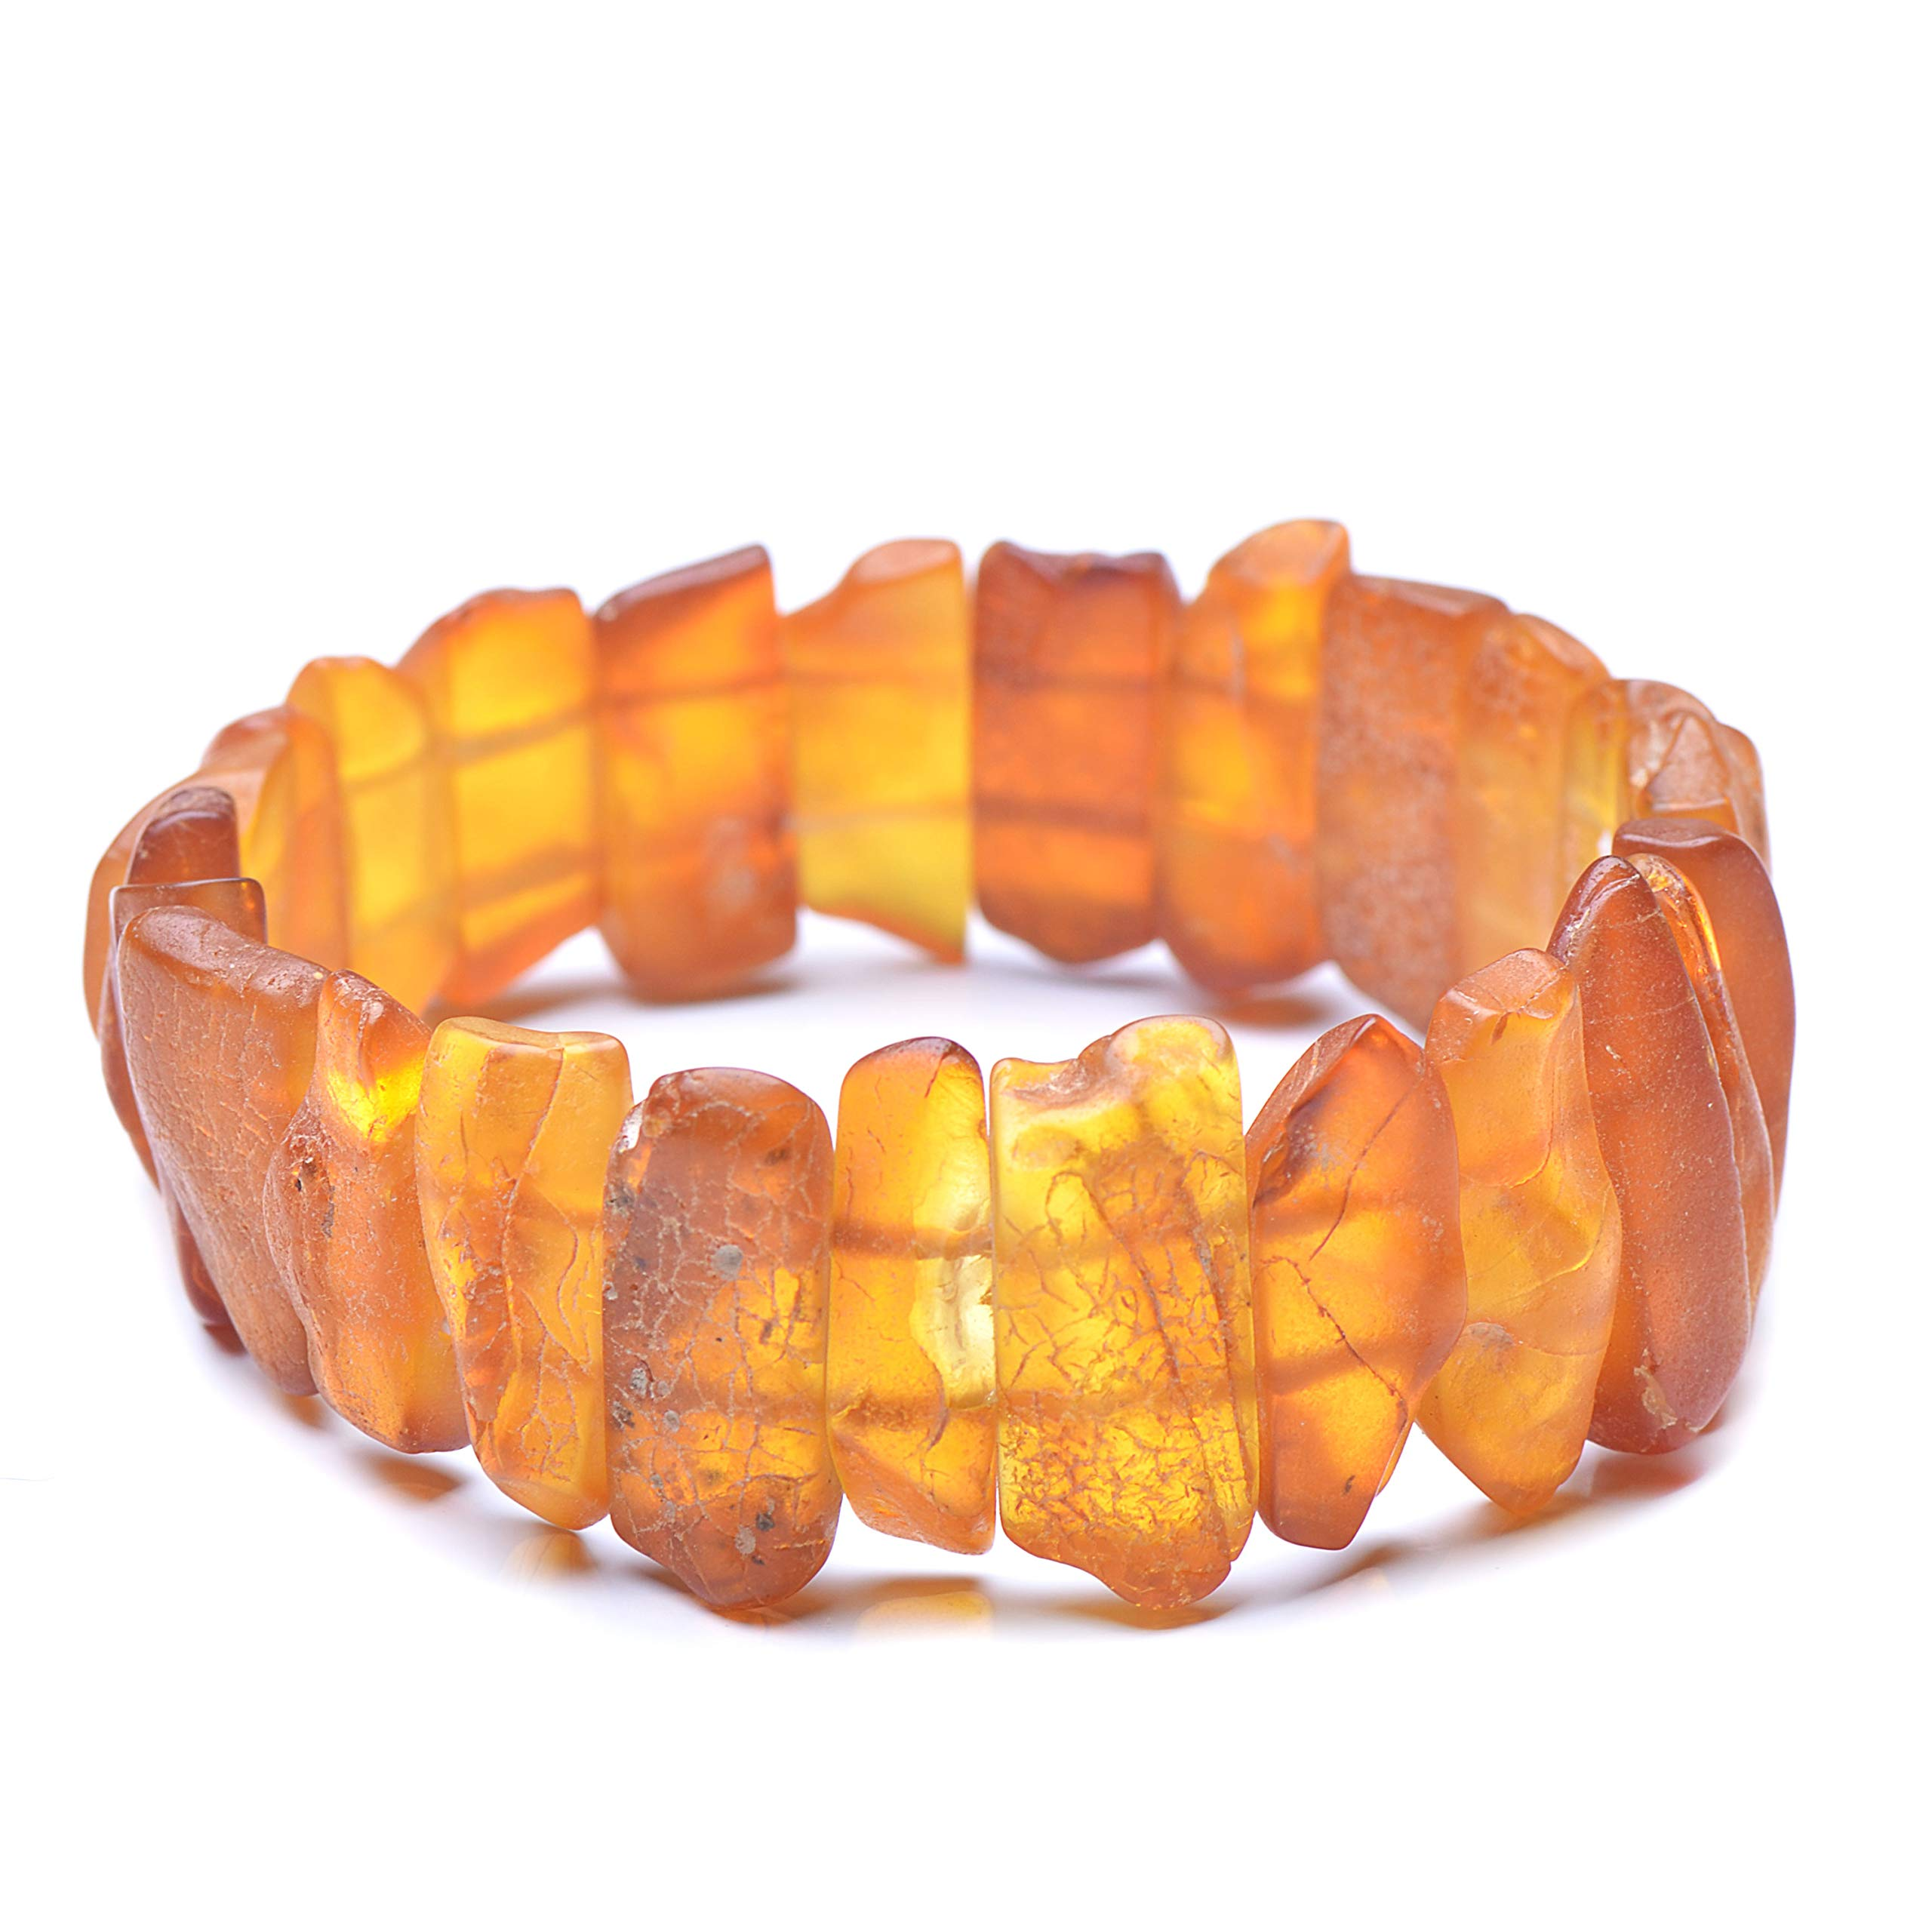 Amber Bracelet - Unique Amber Bracelet - Exclusive Amber Bracelet - Vintage Bracelet - Genuine Baltic Amber by Genuine Amber